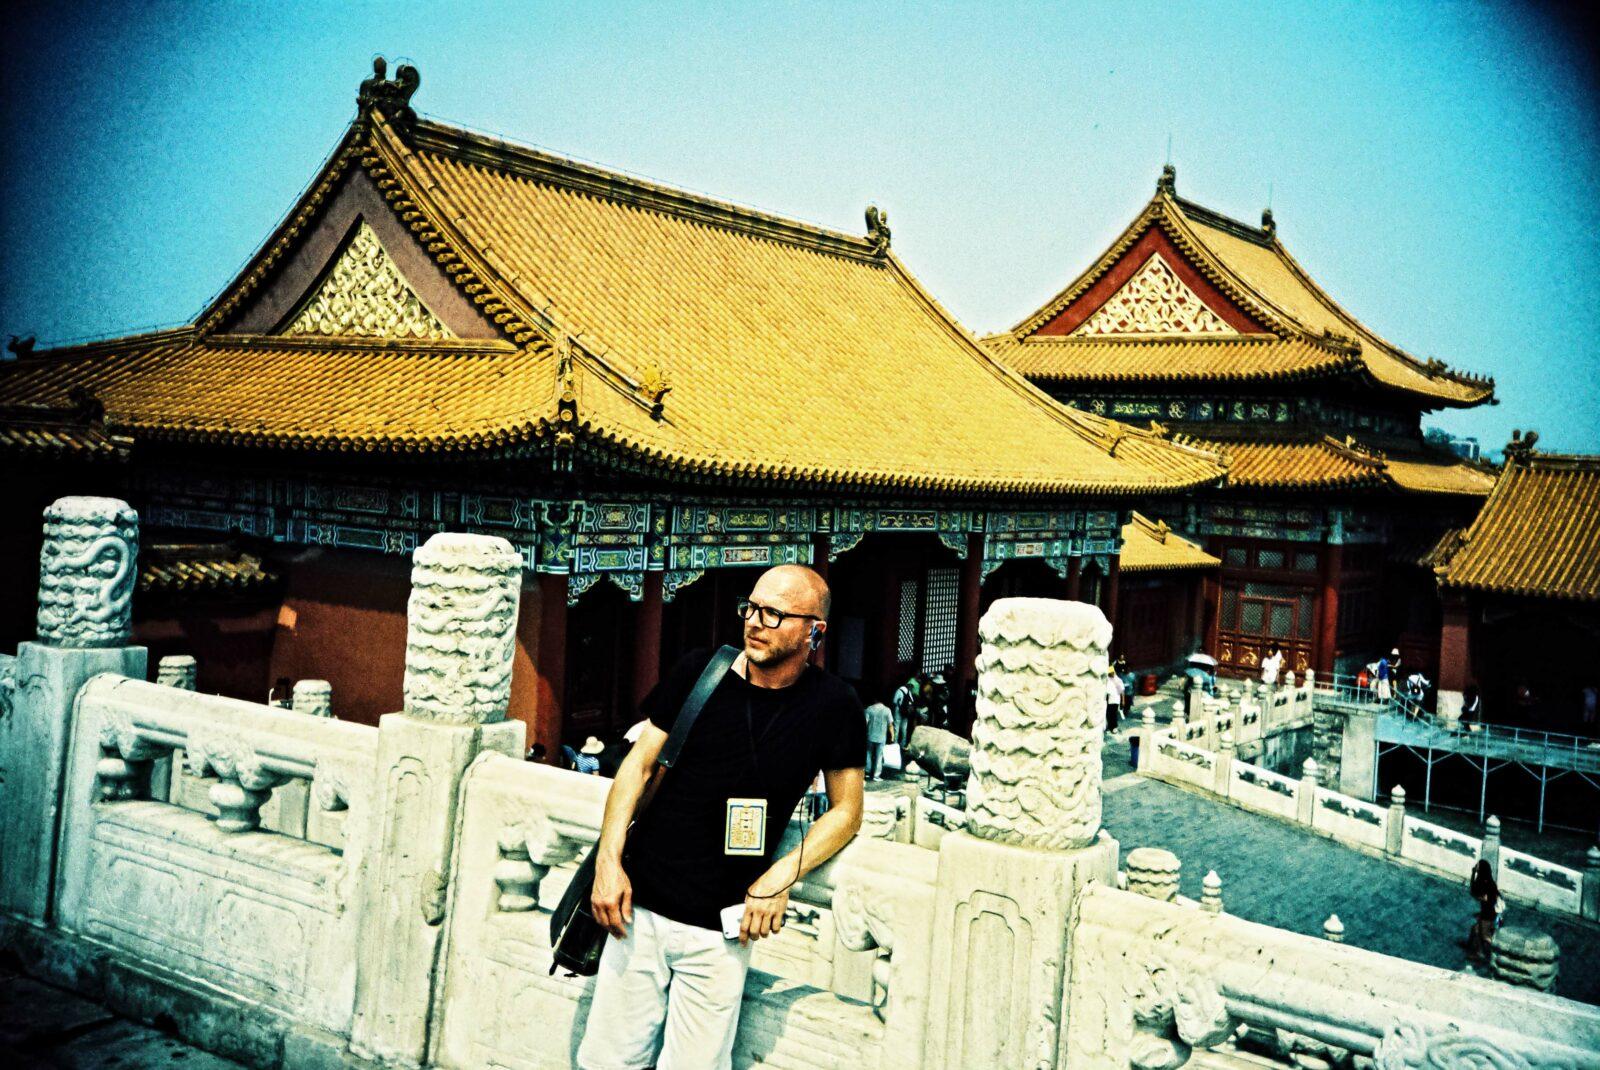 instaCDV 15 China roll11 Beijing ForbiddenCity 000030